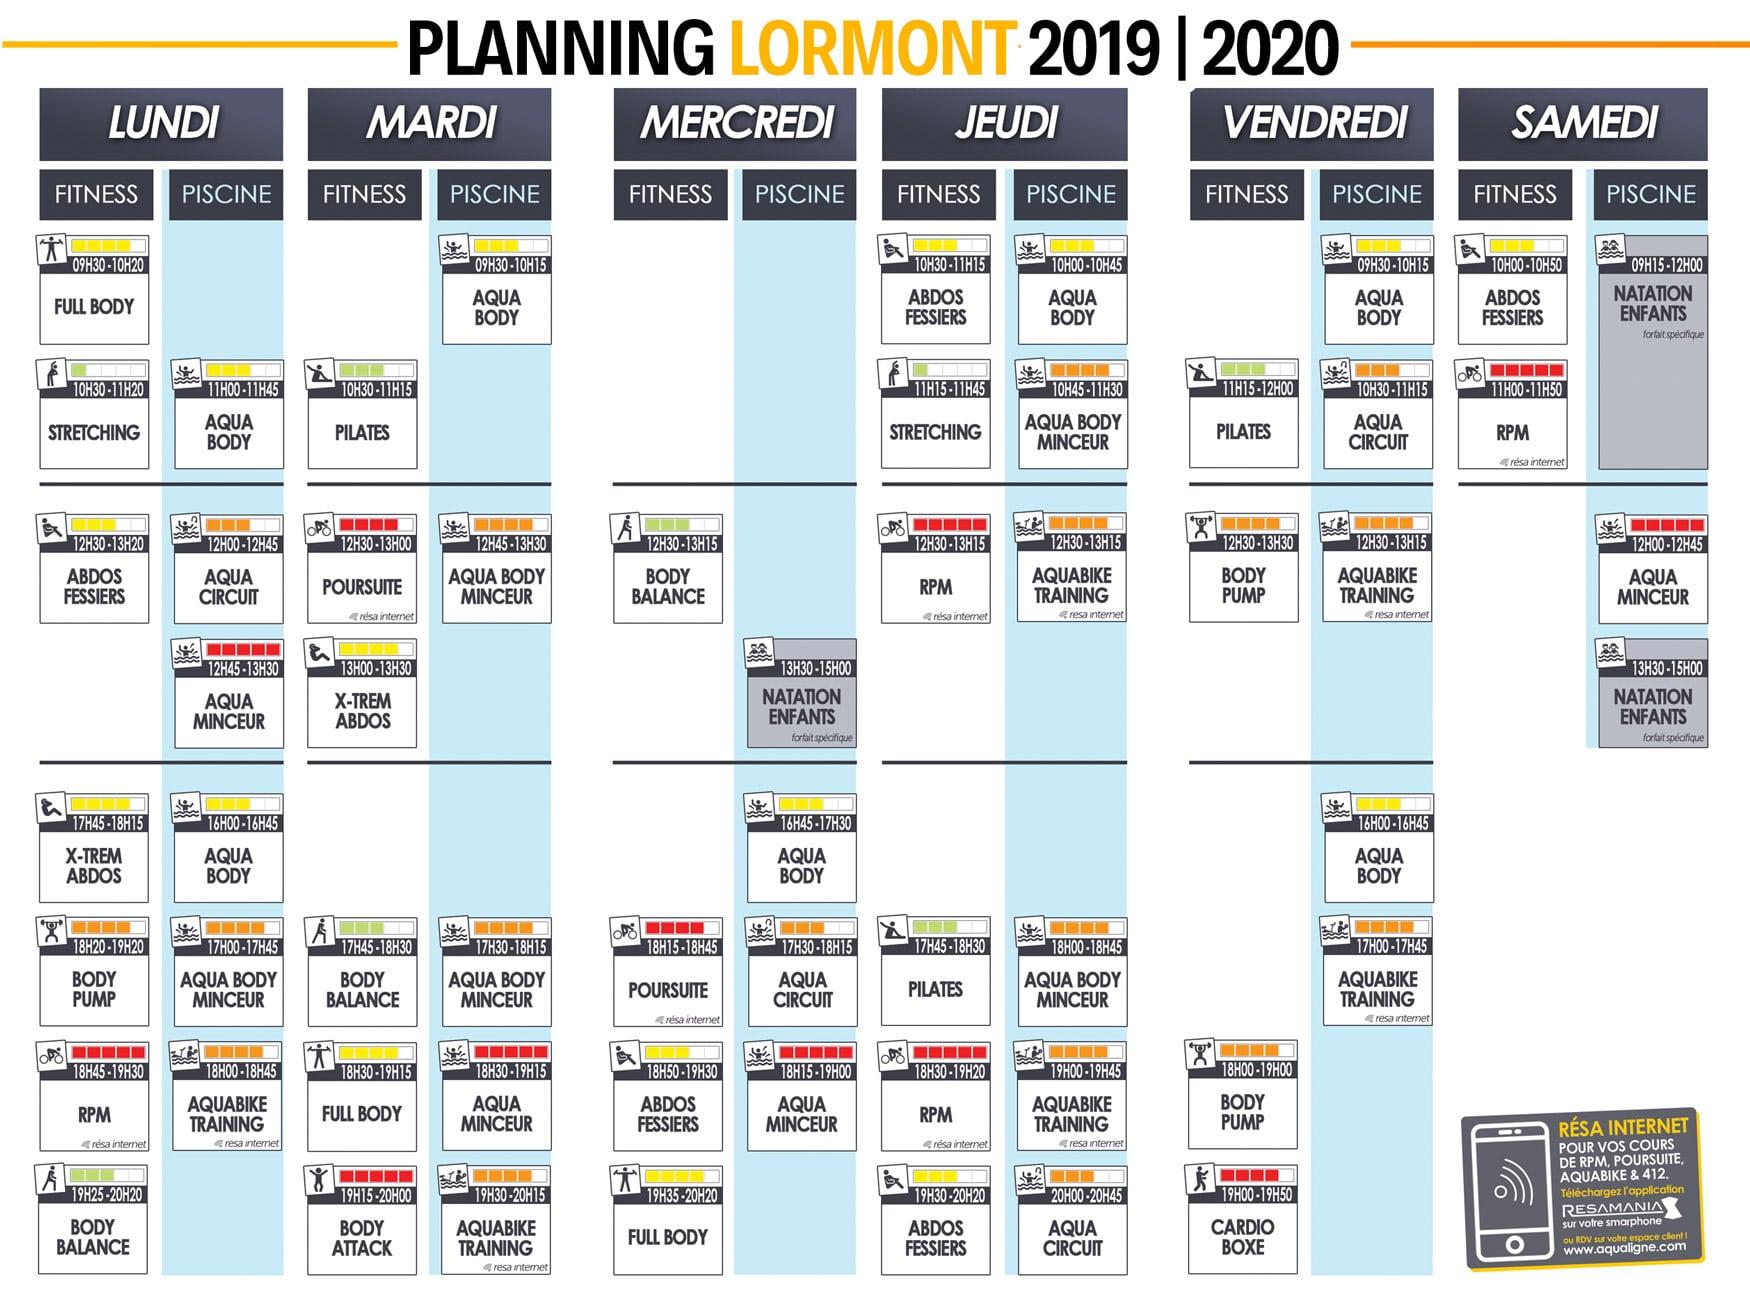 LORMONT-Planning-19-20